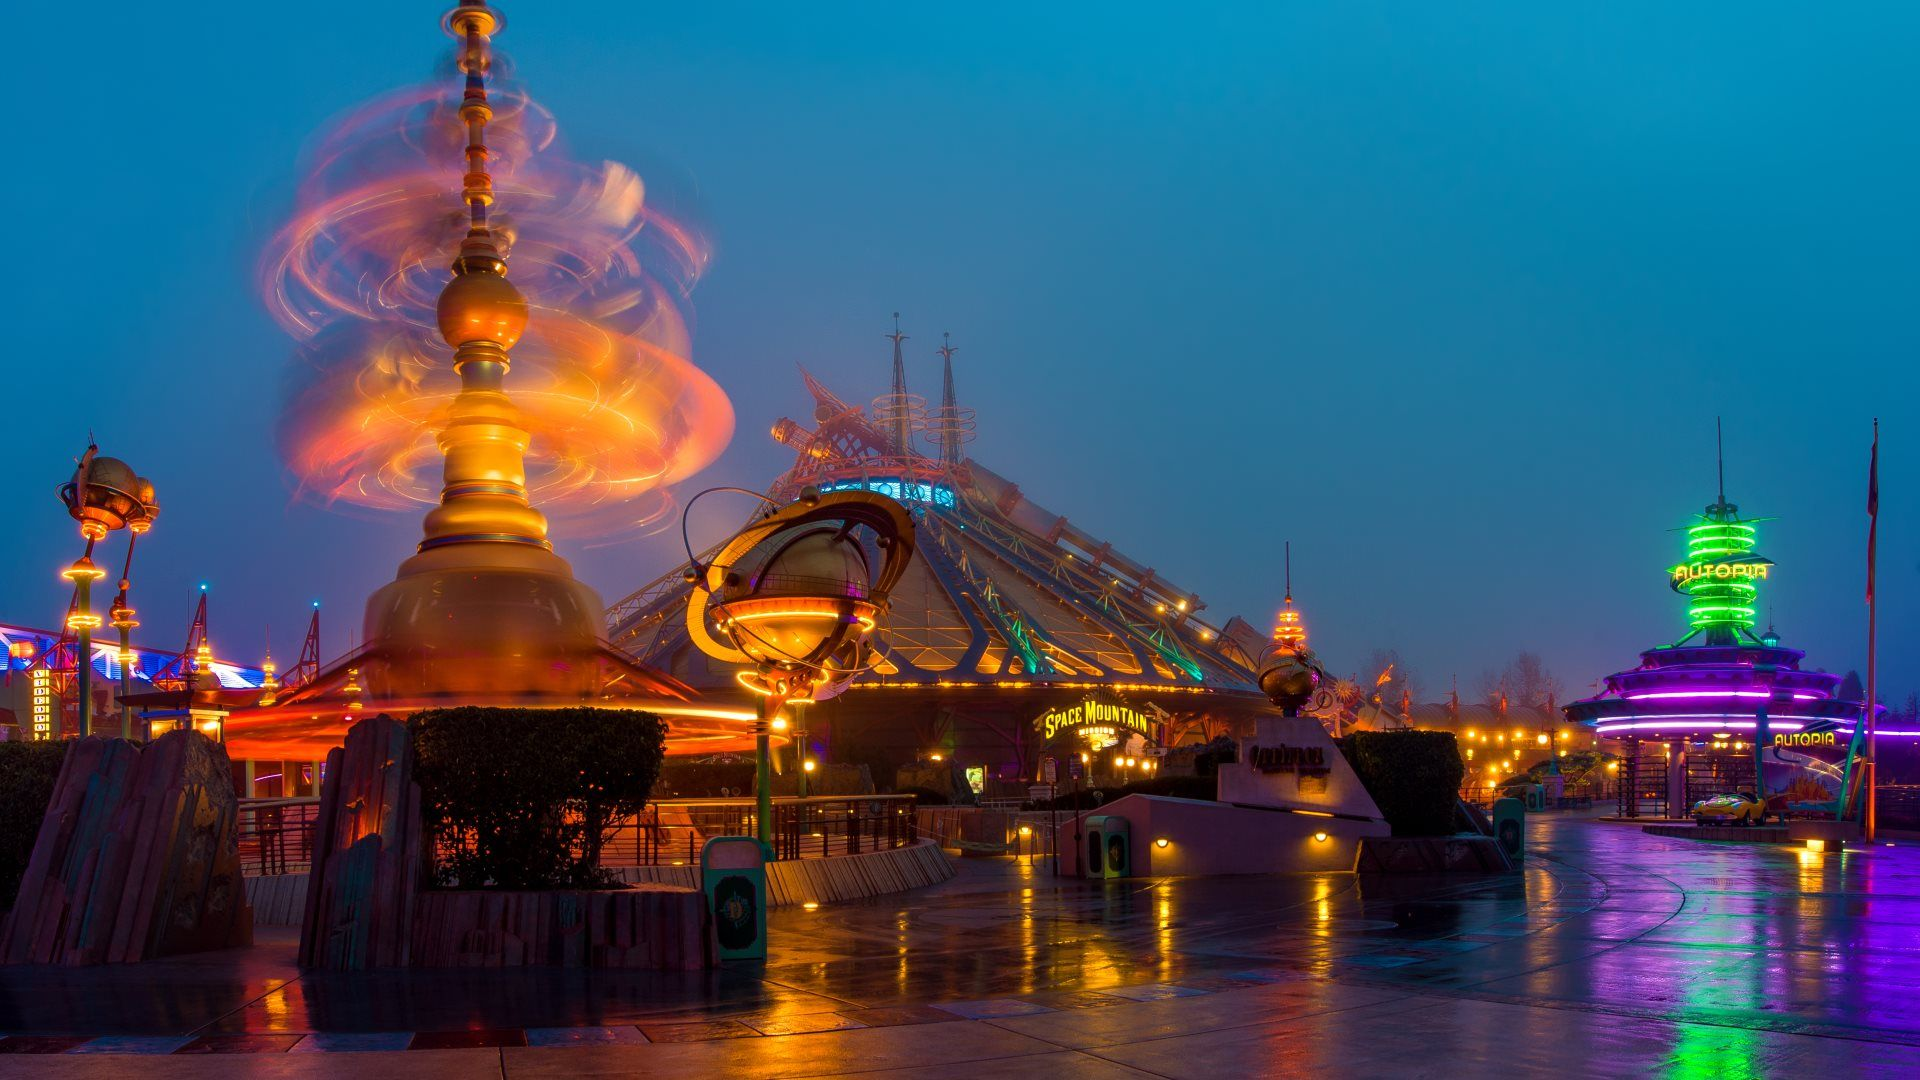 Disneyland Paris Discoveryland